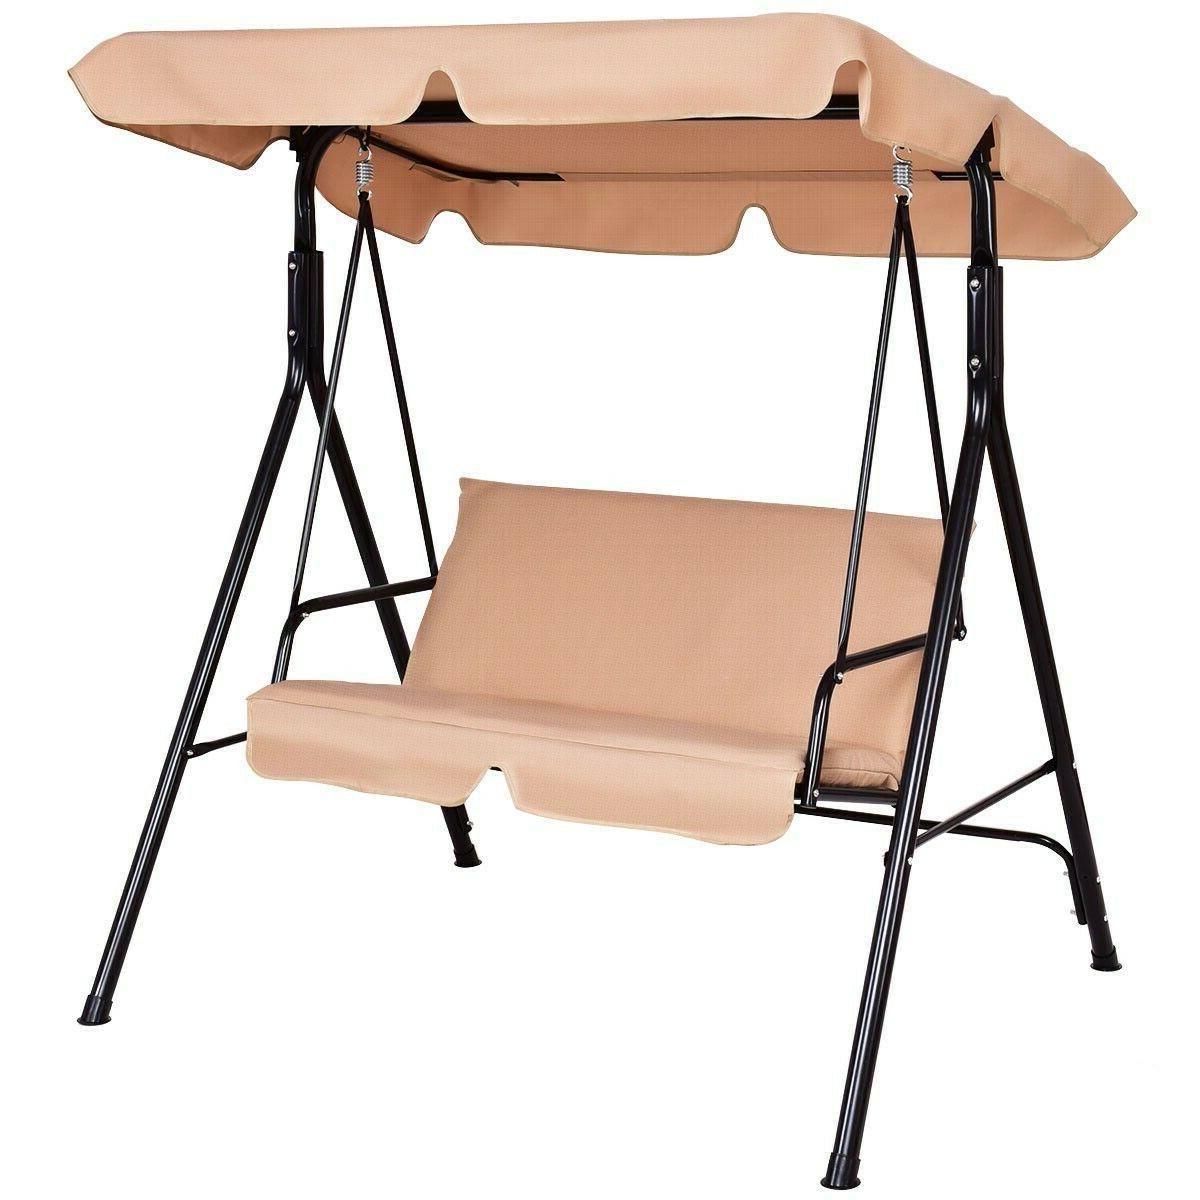 Costway Loveseat Patio Canopy Swing Glider Hammock Cushioned